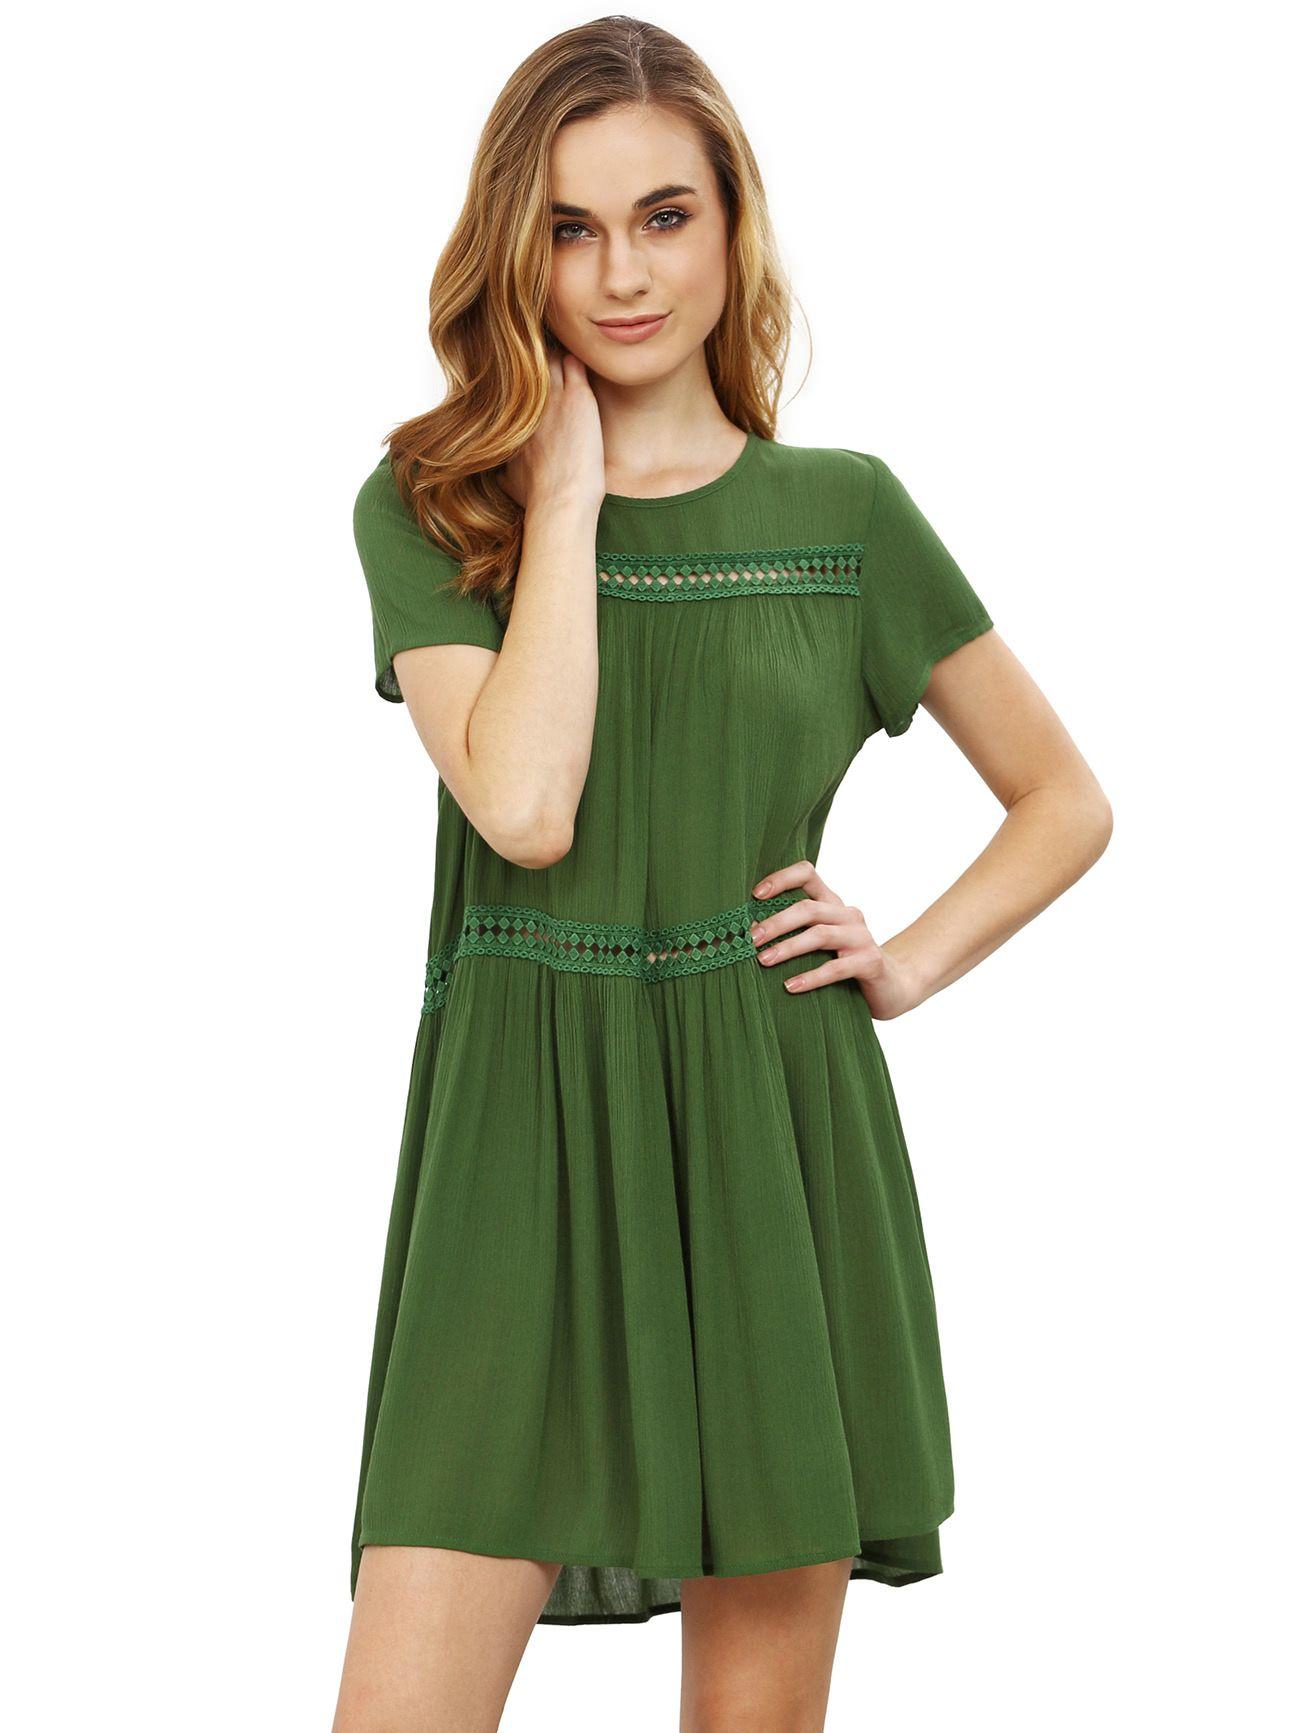 Robe A Manches Courtes Short Sleeve Shift Dress Short Sleeve Maxi Dresses Women Dress Online [ 1733 x 1301 Pixel ]